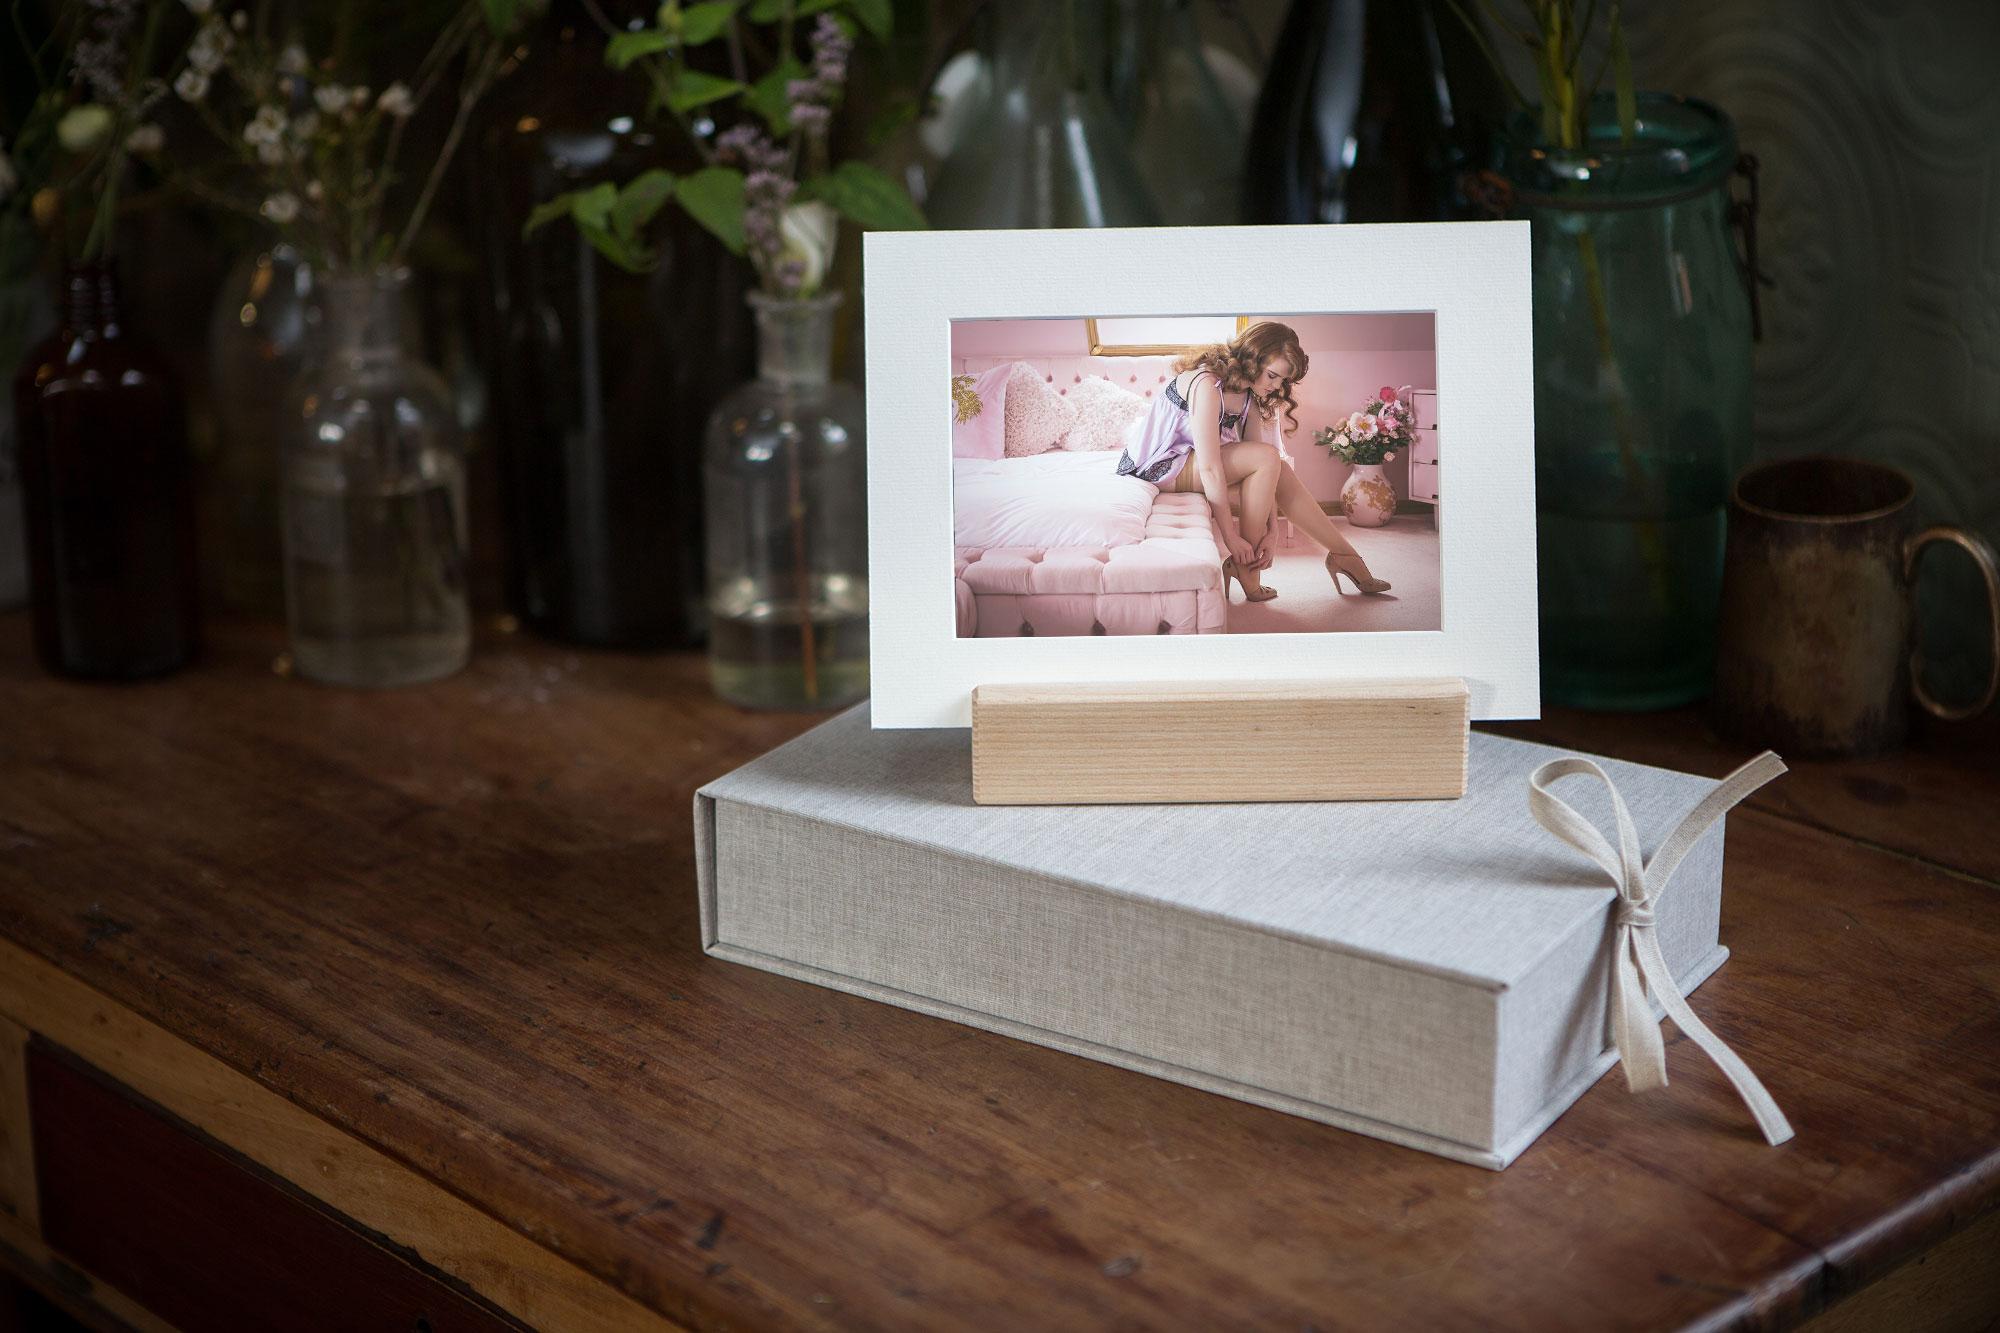 boudoir albums and fine art prints from UK Boudoir Photographer Tigz Rice